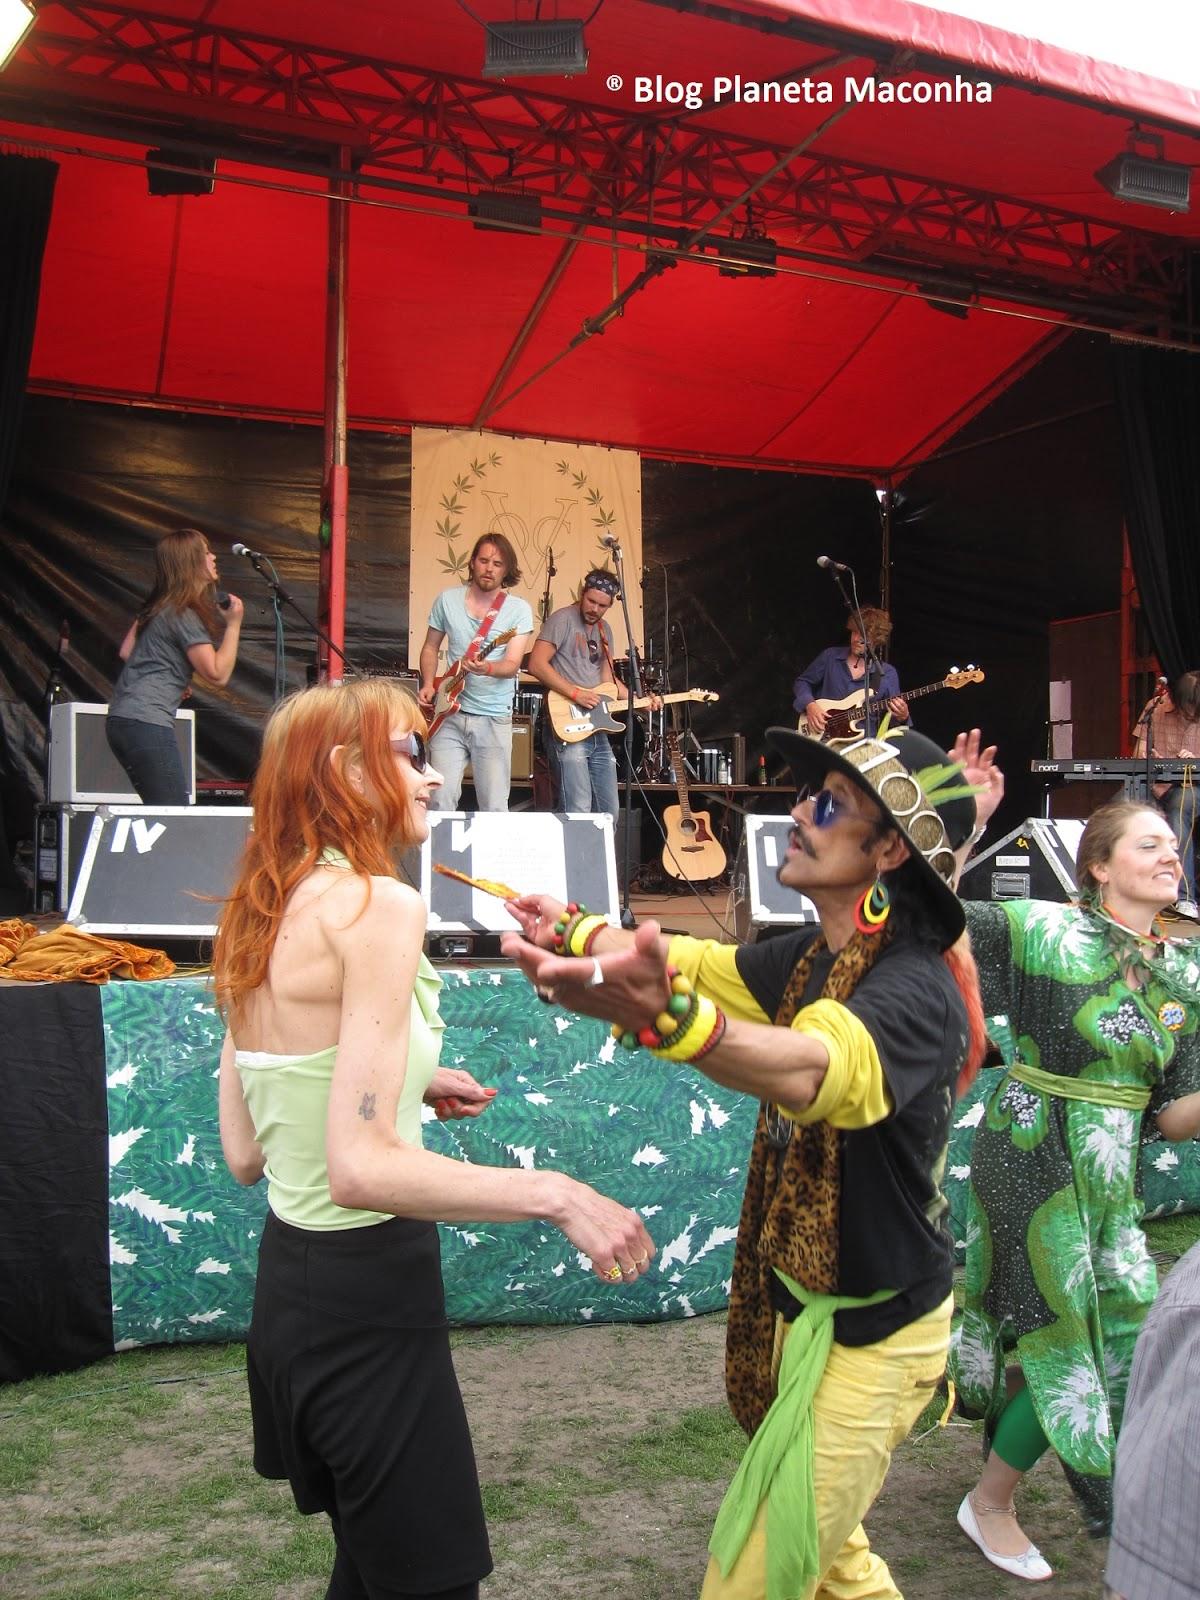 Muita musica ao vivo na Marcha da Maconha de Amsterdam 2013